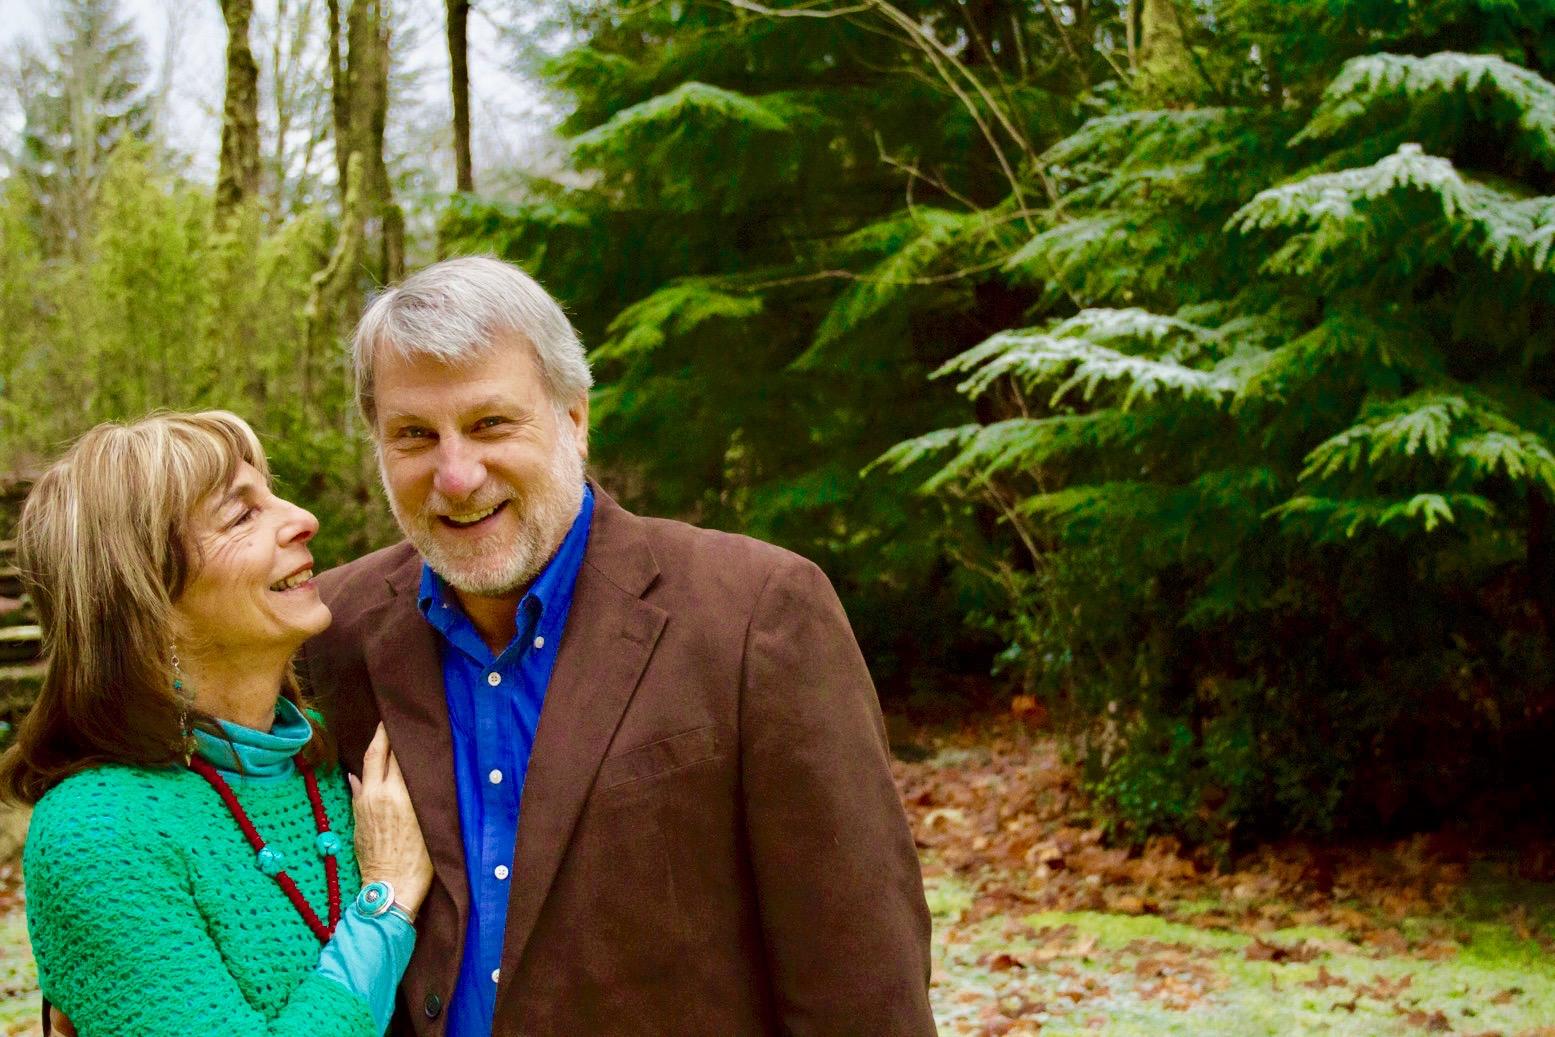 David and Diane enjoying a walk through the forest.